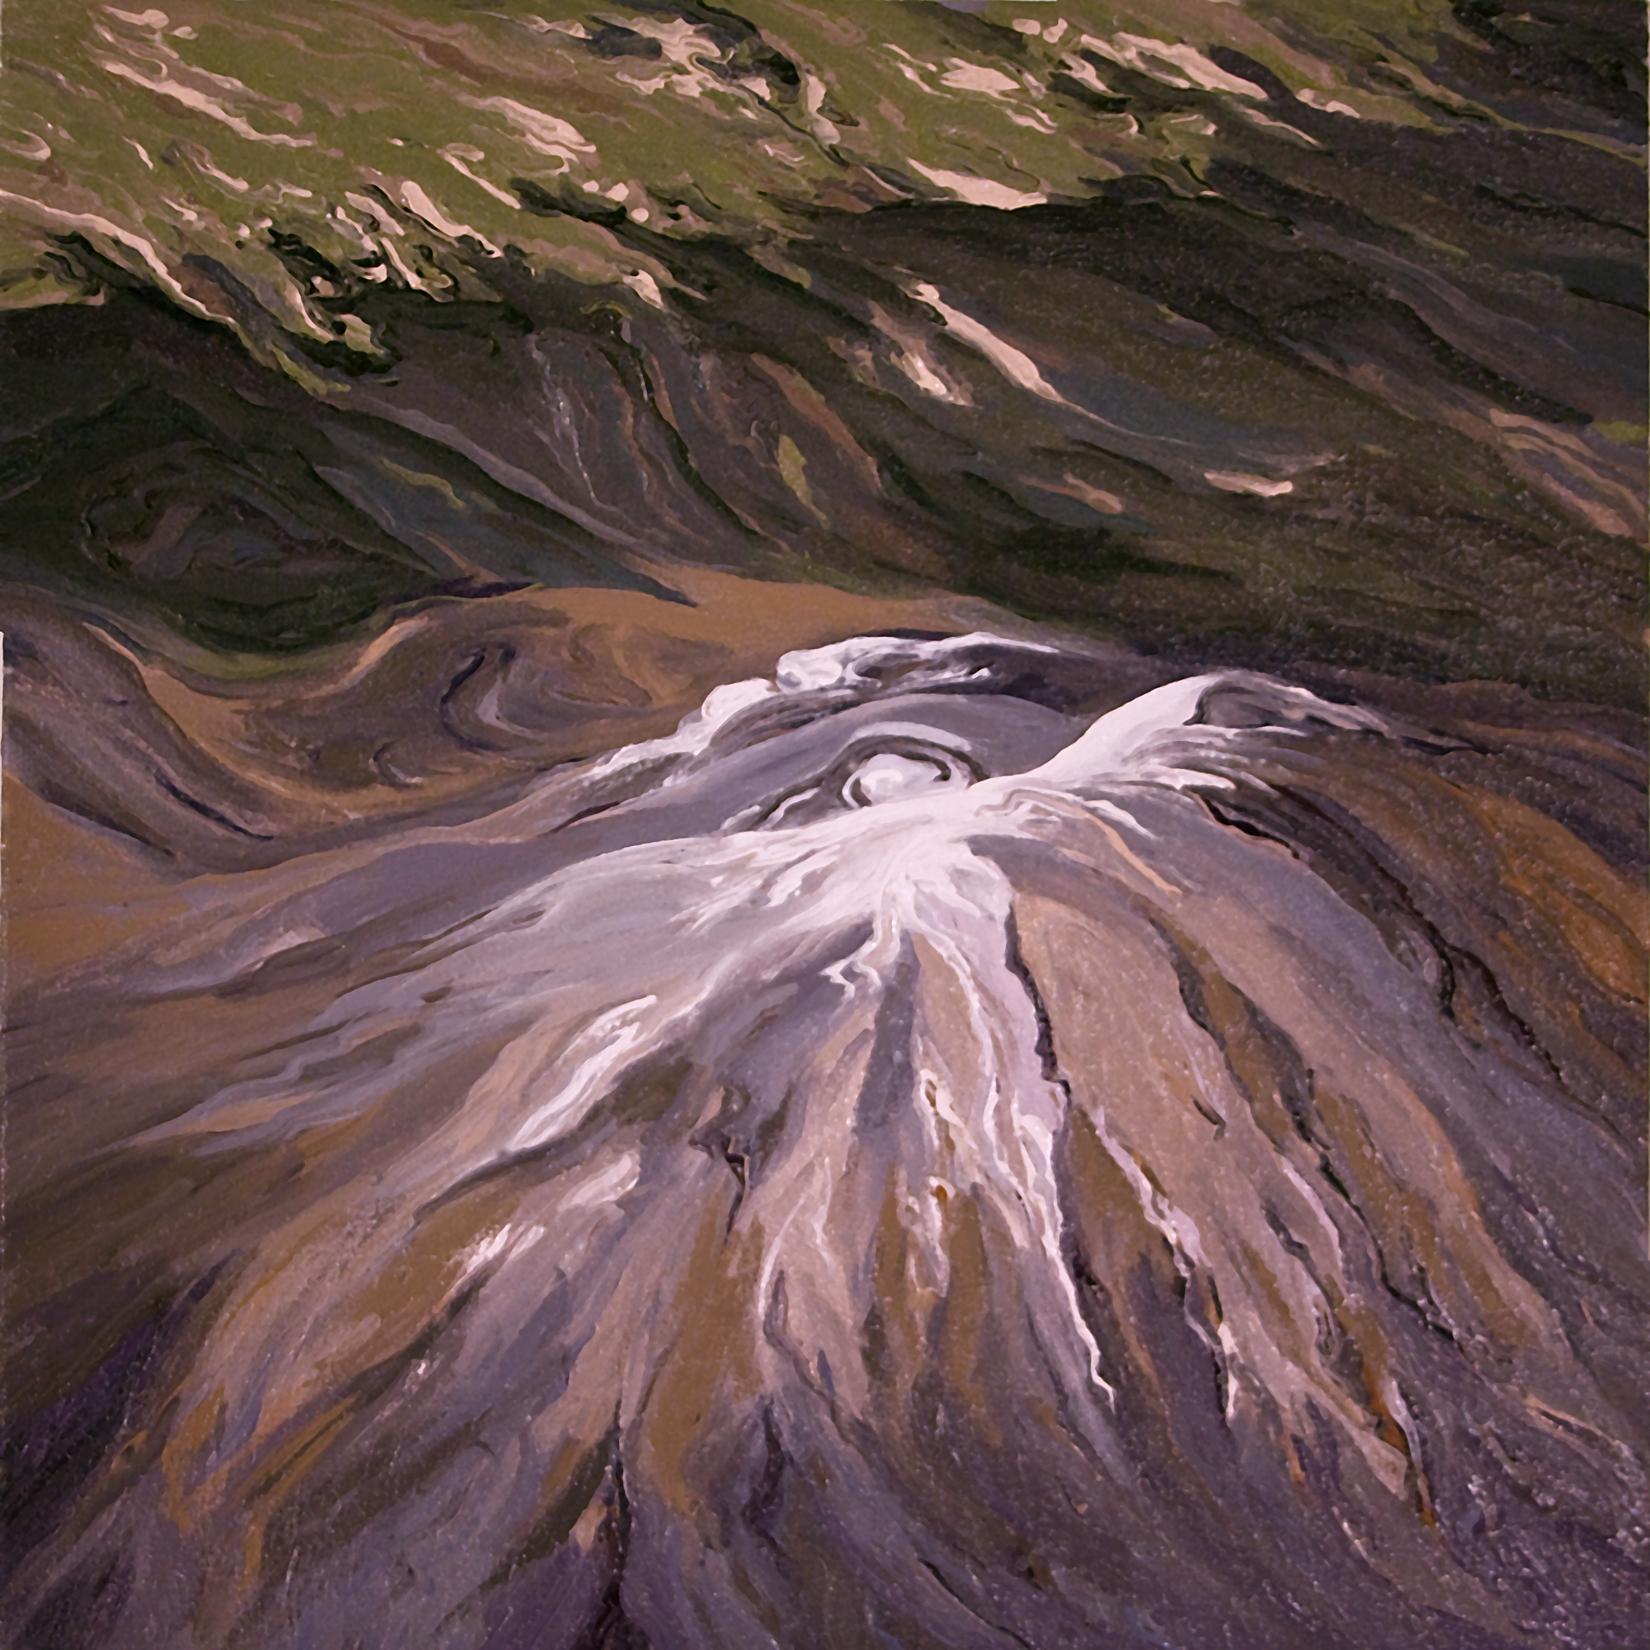 Kilimanjaro #6, 2000 from NASA Earth Observatory